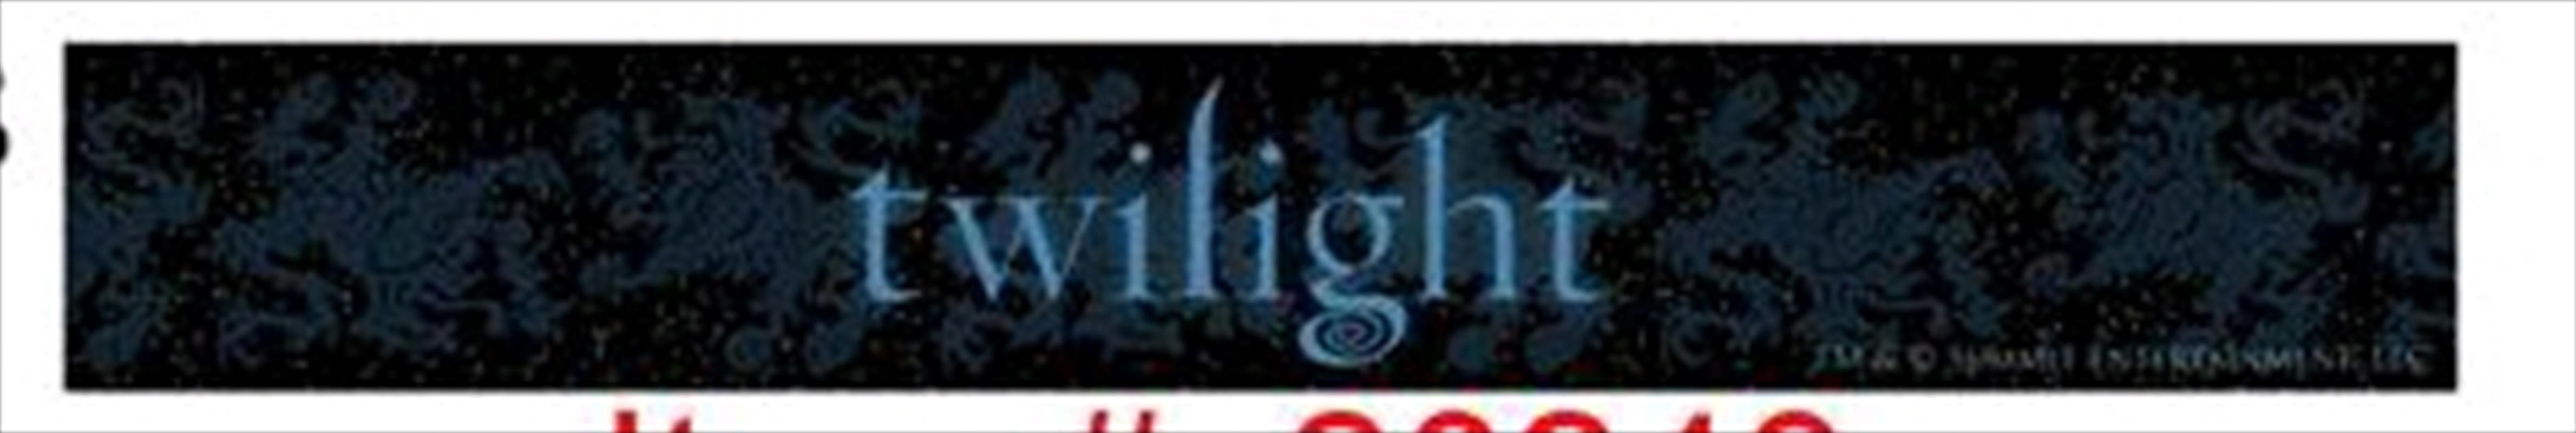 Twilight - Jewellery Slap Bracelet Logo | Apparel